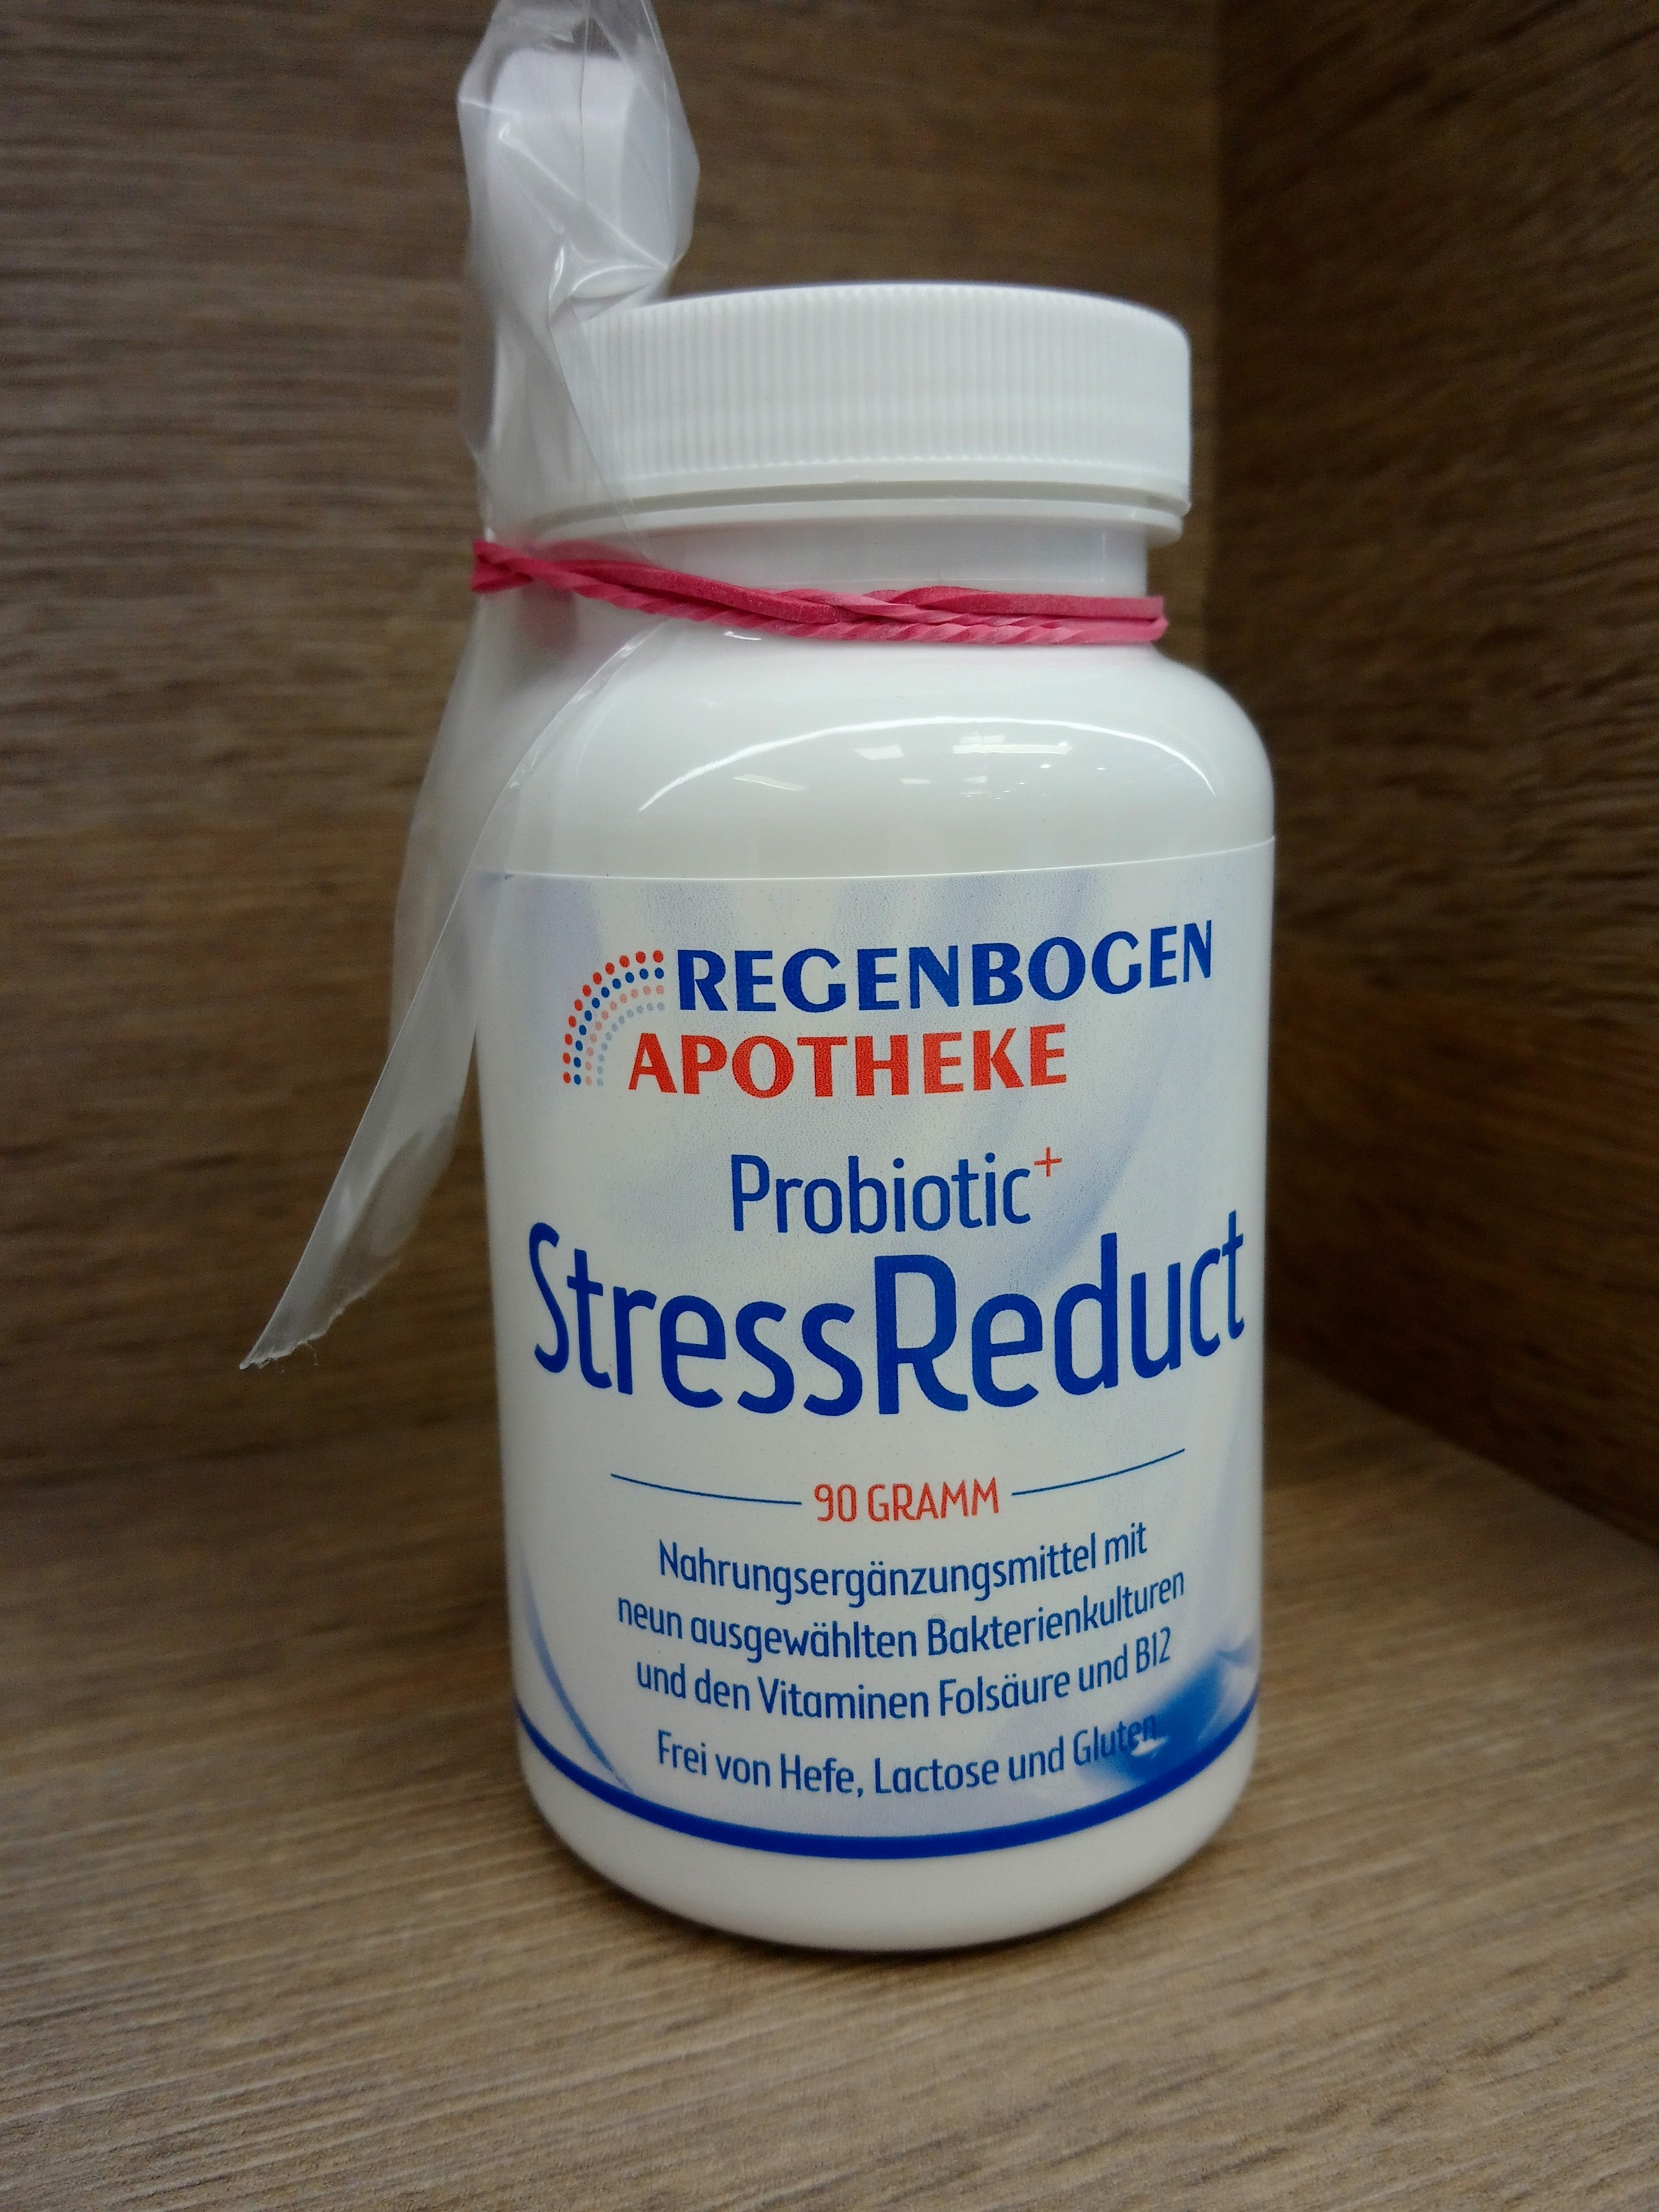 Regenbogen Apotheke Probiotic+ Stress Reduct 90g